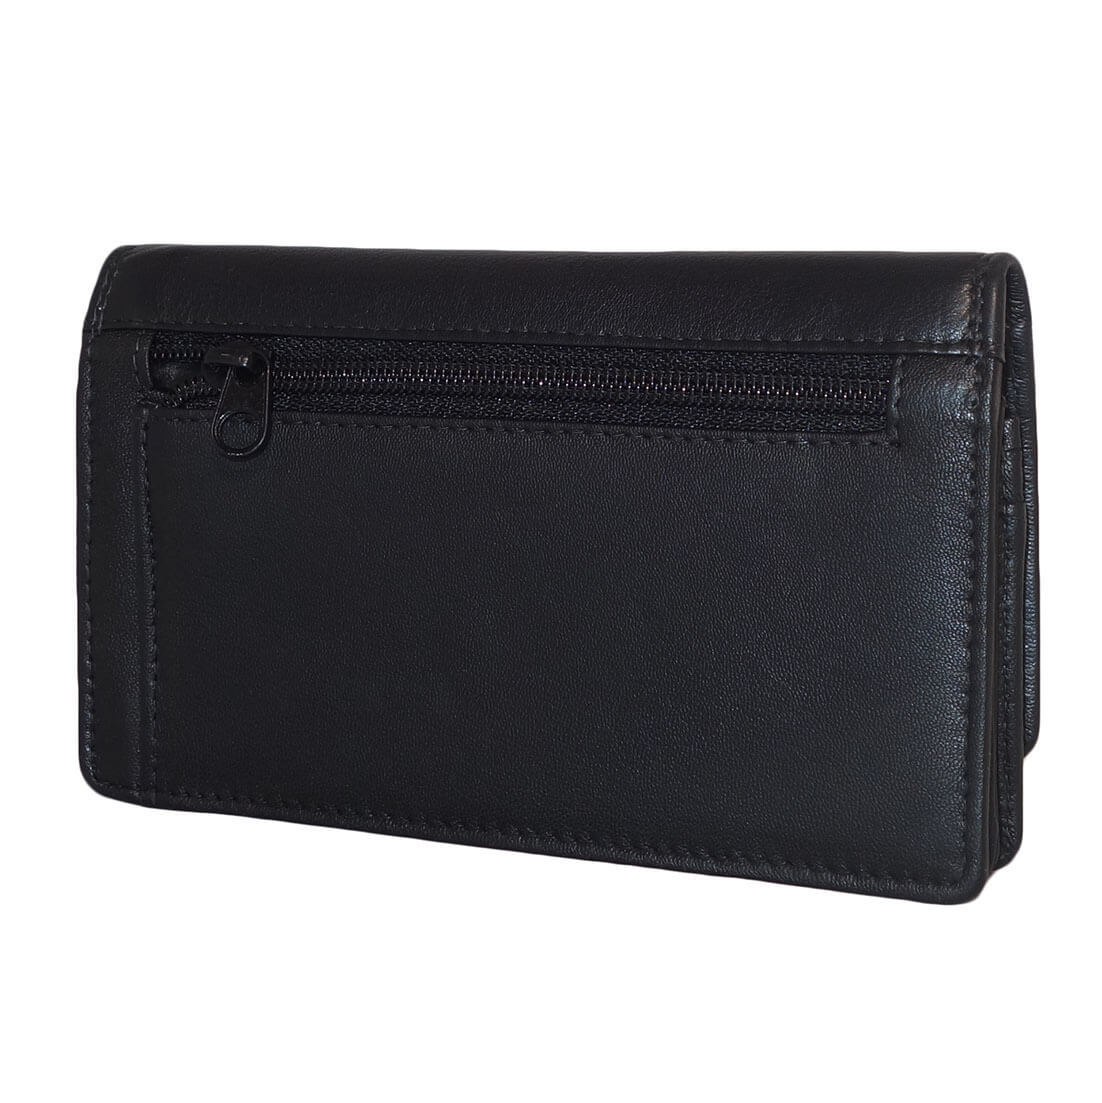 4d19470ca67 leather_design_portemonnee_met_overslag_kt-6313_zwart_2  leather_design_portemonnee_met_overslag_kt-6313_zwart_3  leather_design_portemonnee_met_overslag_kt- ...